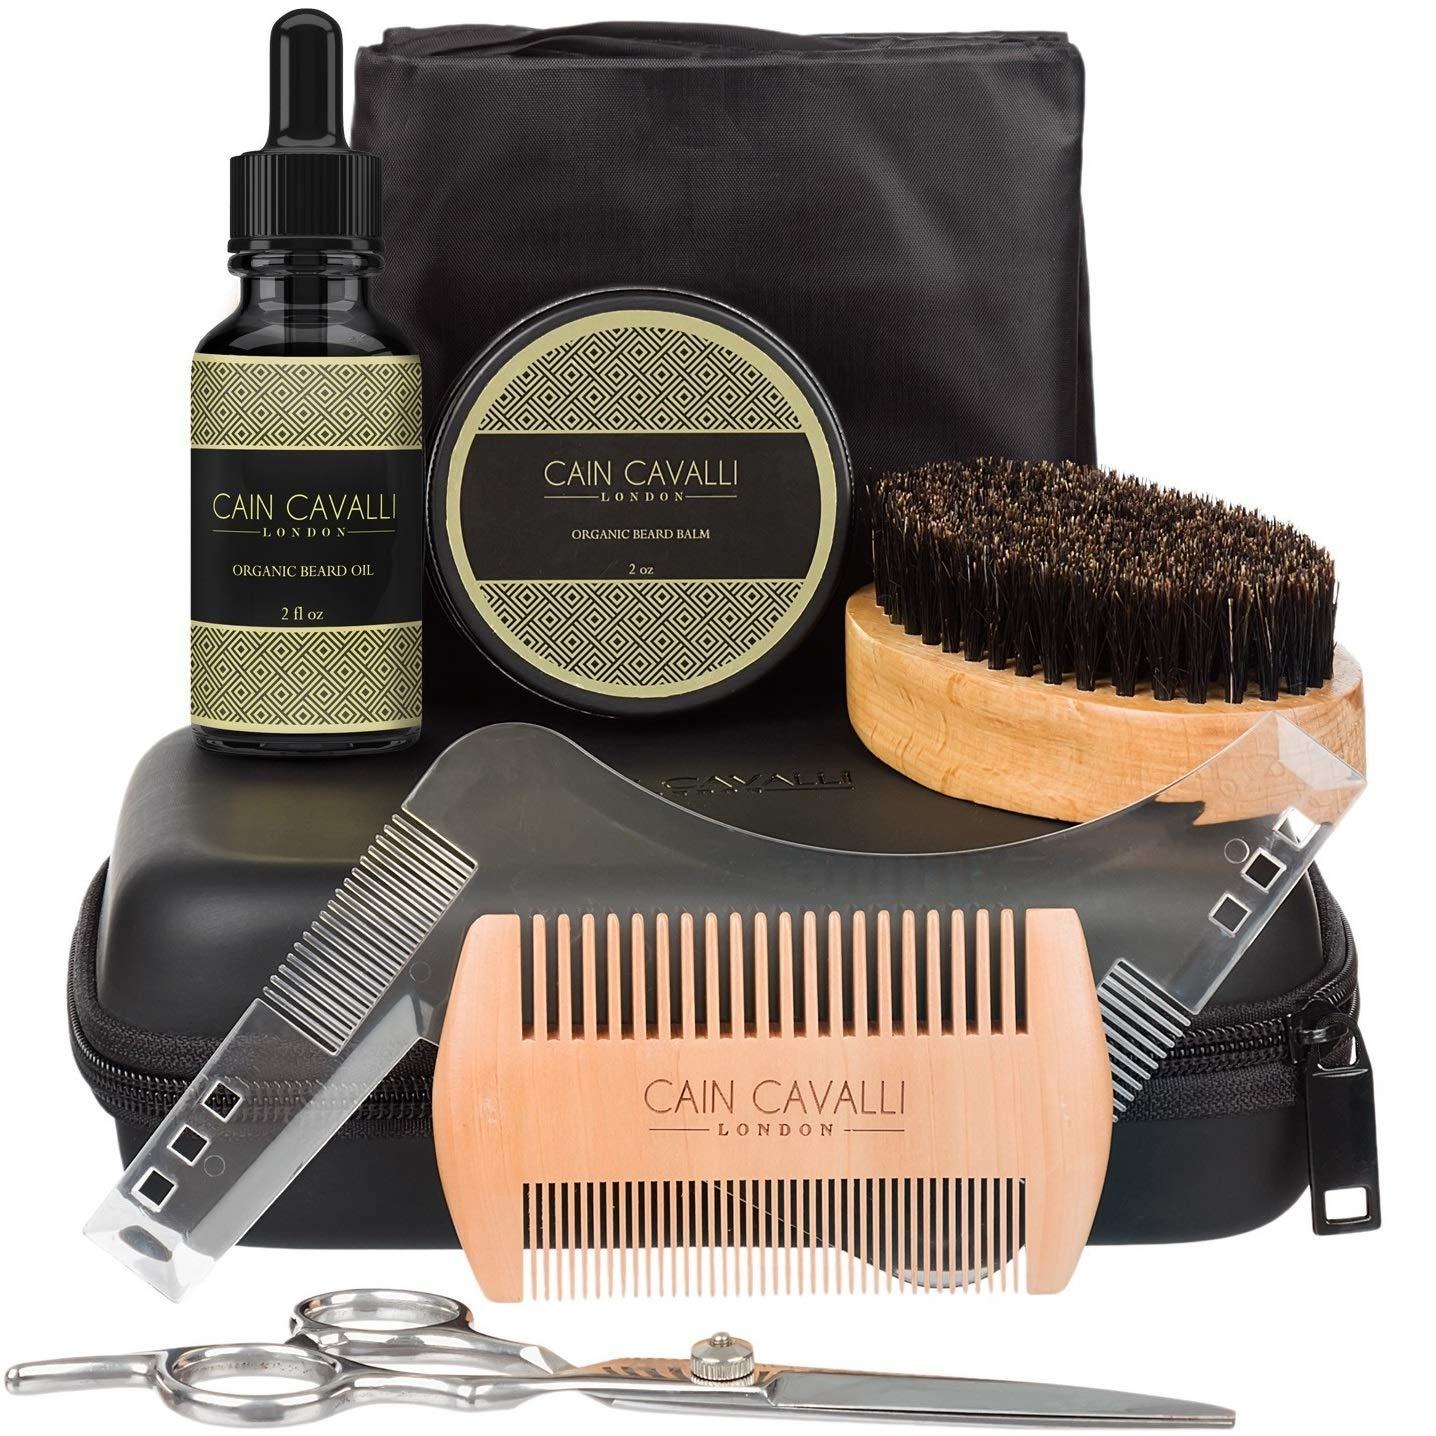 Cain Cavalli Premium 8 in 1 Beard Care Grooming Kit - Travel Case, Shaper Template, Apron, Organic Oil Conditioner & Wax Balm, Trimming Scissors, Comb, Brush - Ultimate Trimmer Accessories Set for Men